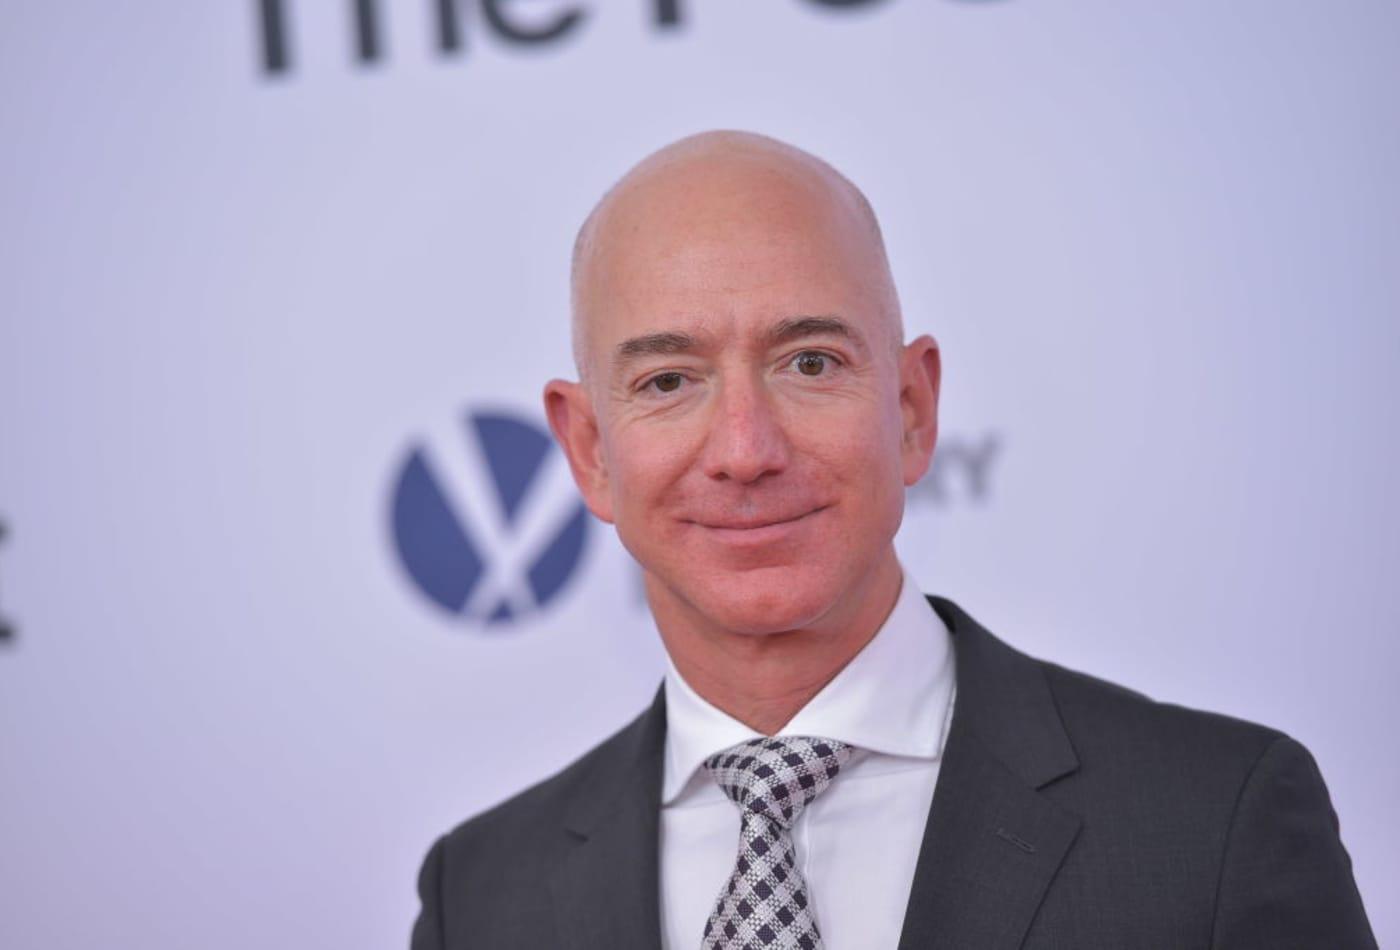 The inspiring quote Amazon CEO Jeff Bezos keeps on his fridge